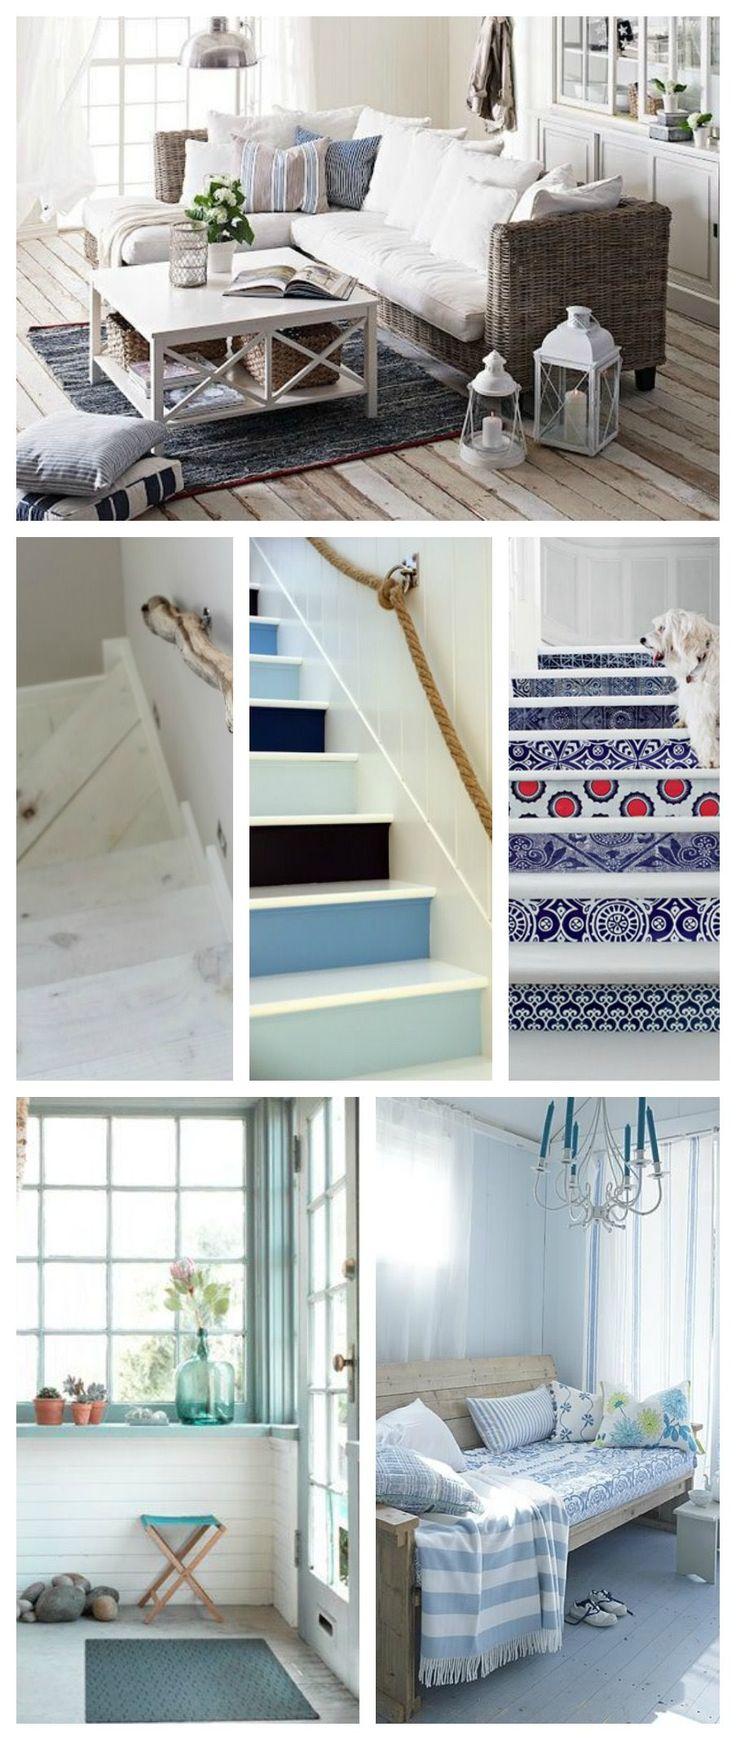 18 best casa al mare images on pinterest summer houses for Case in stile adobe